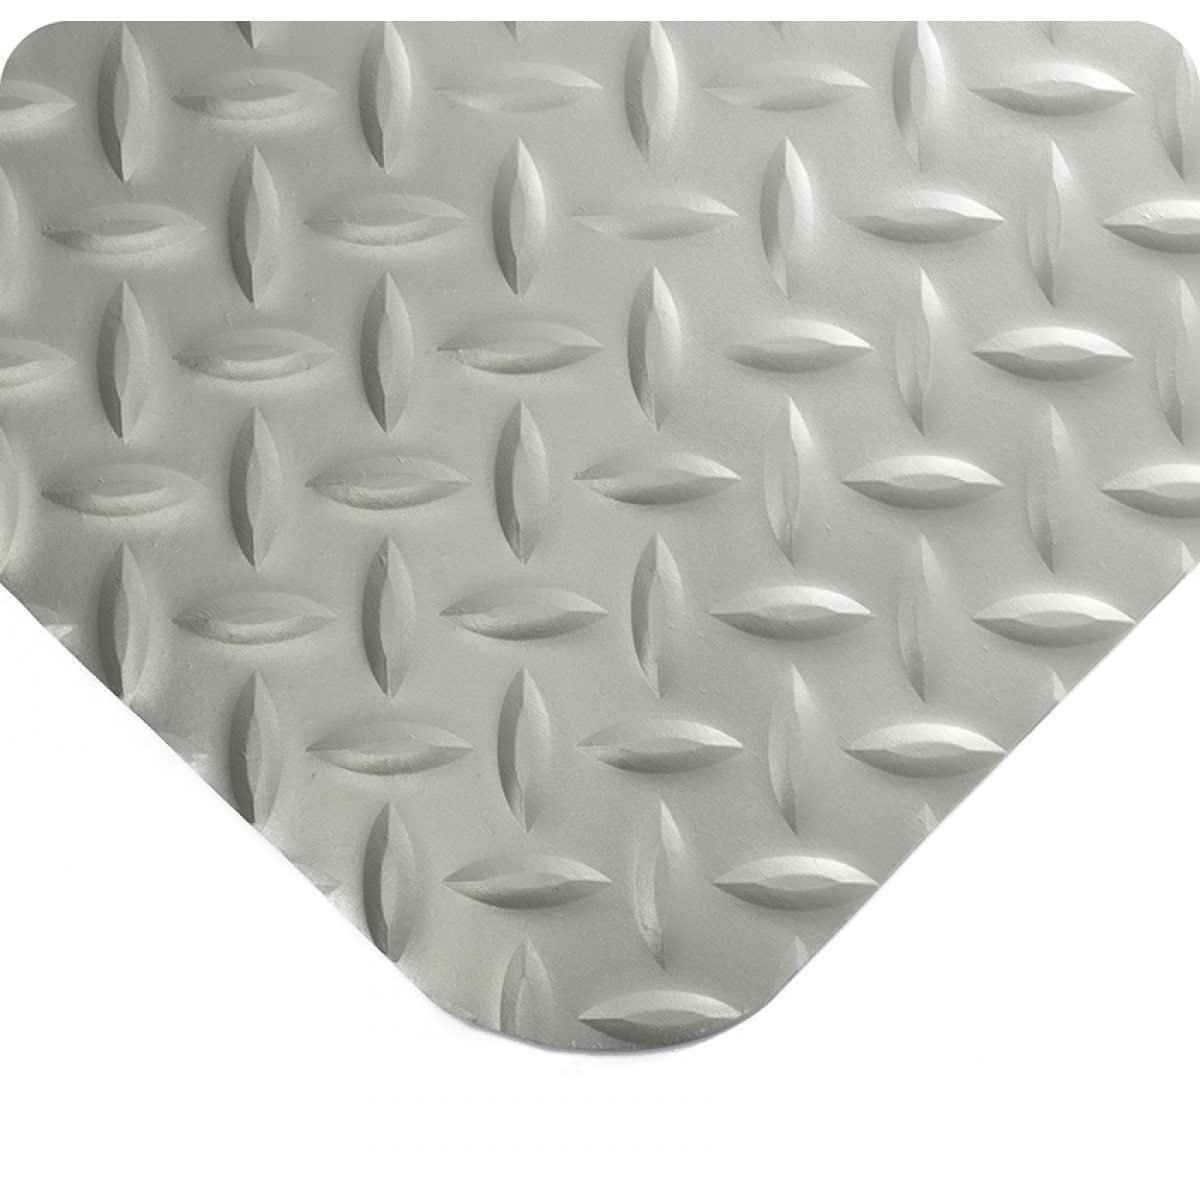 "Wearwell 414.1516x2x40GY Diamond-Plate SpongeCote Ultrasoft Mat, 40' Length x 2' Width x 15/16"" Thick, Gray"